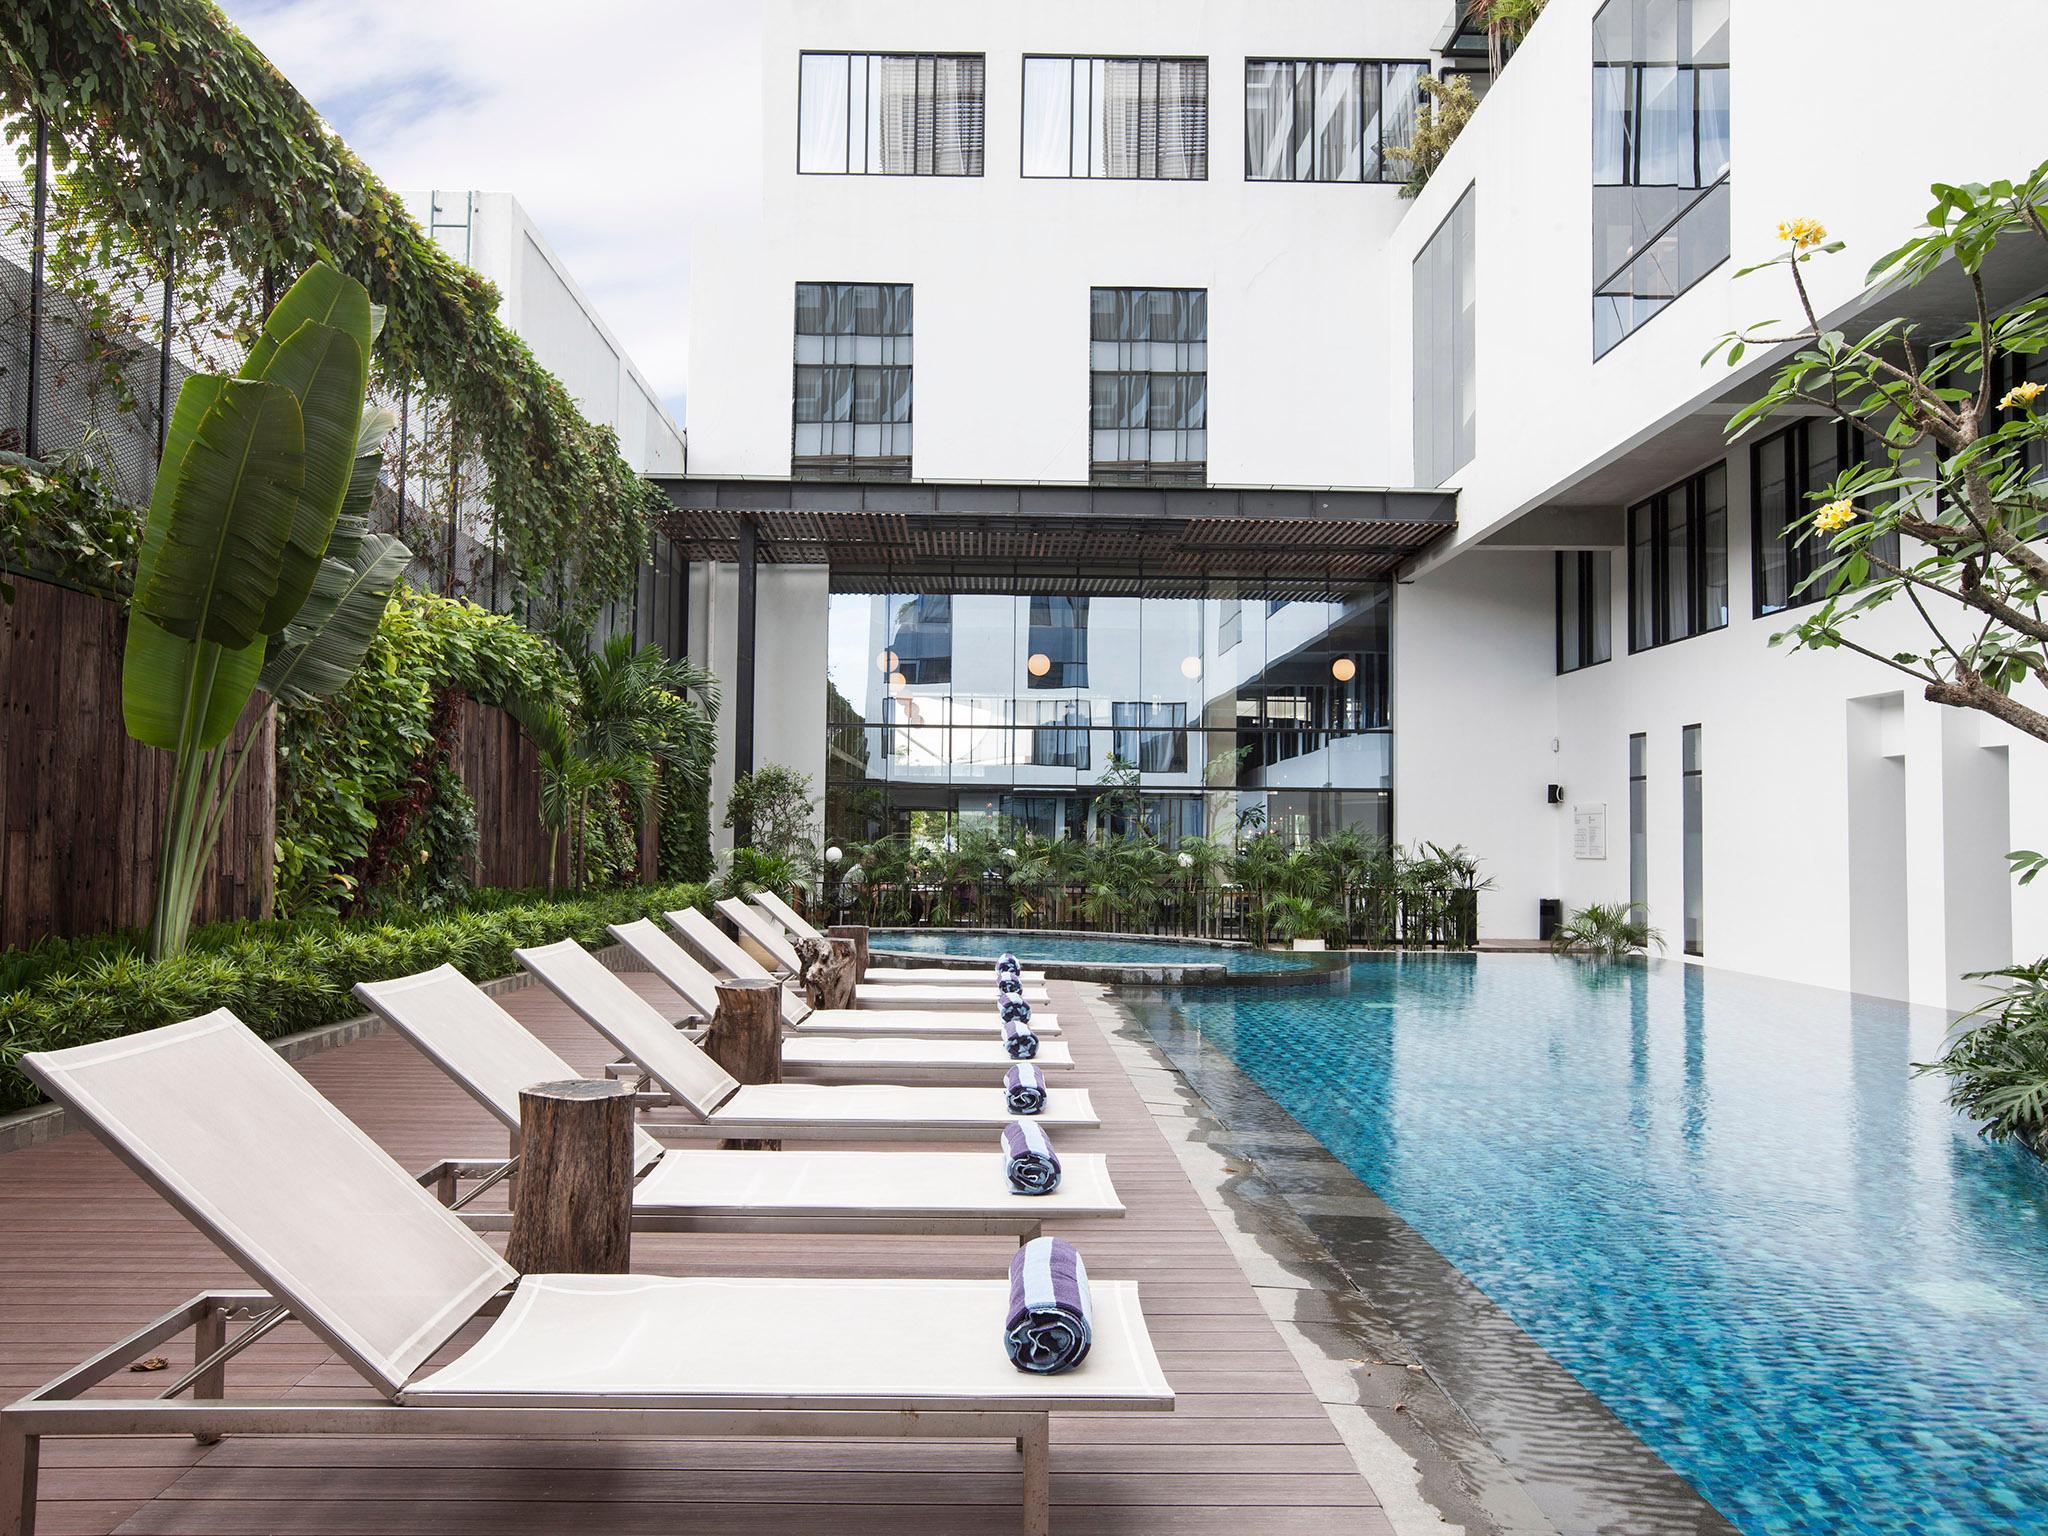 Gaia Cosmo Hotel Yogyakarta